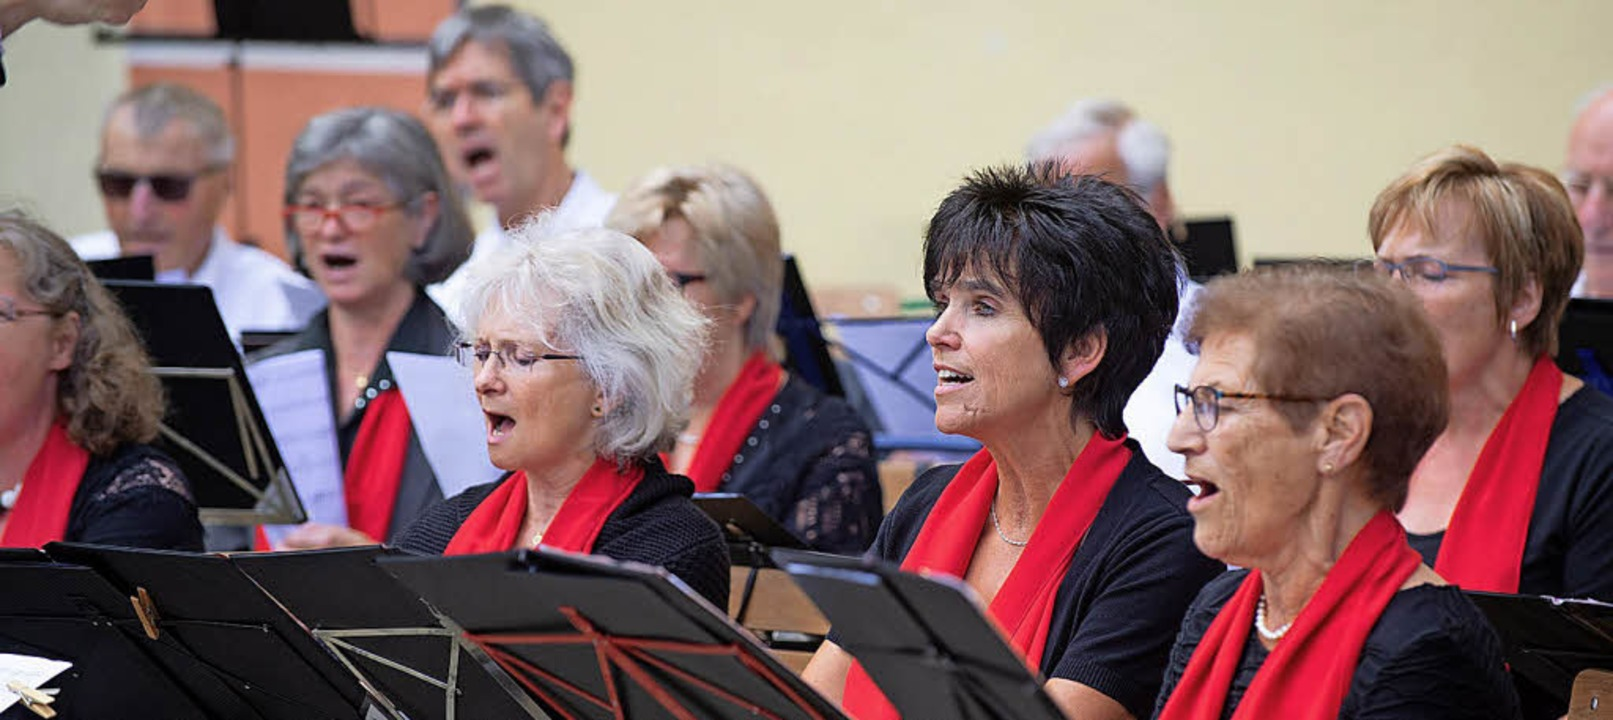 St. Märgen singt und klingt.  | Foto: Wolfgang Scheu